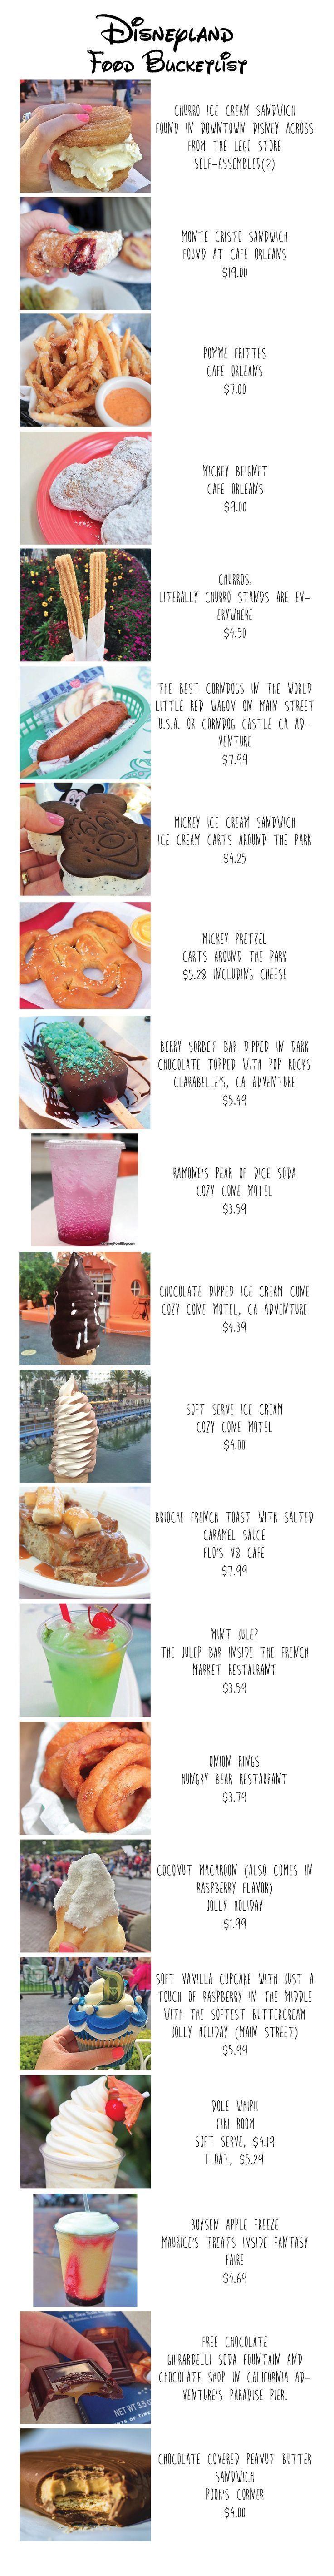 Disneyland Food Bucketlist #vacationhacks